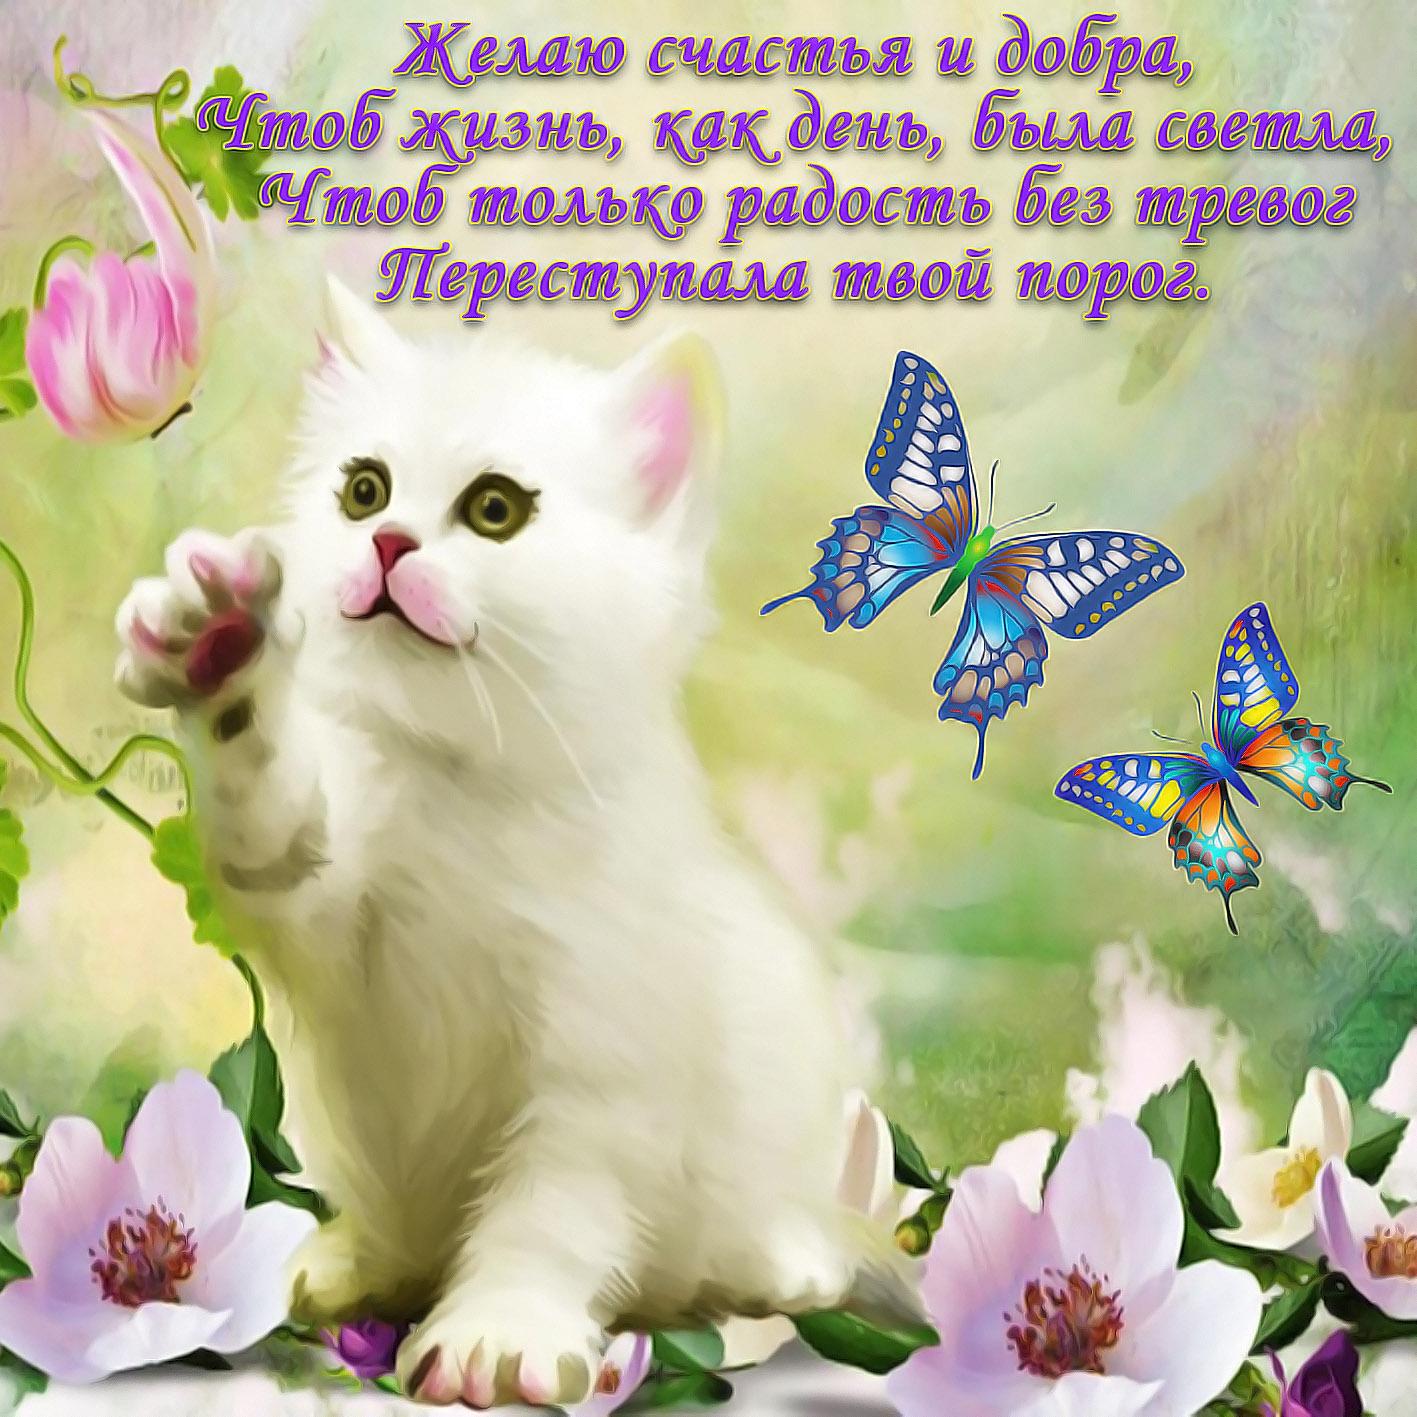 Открытки красивые котят с пожеланиями, юбилеем бабушке